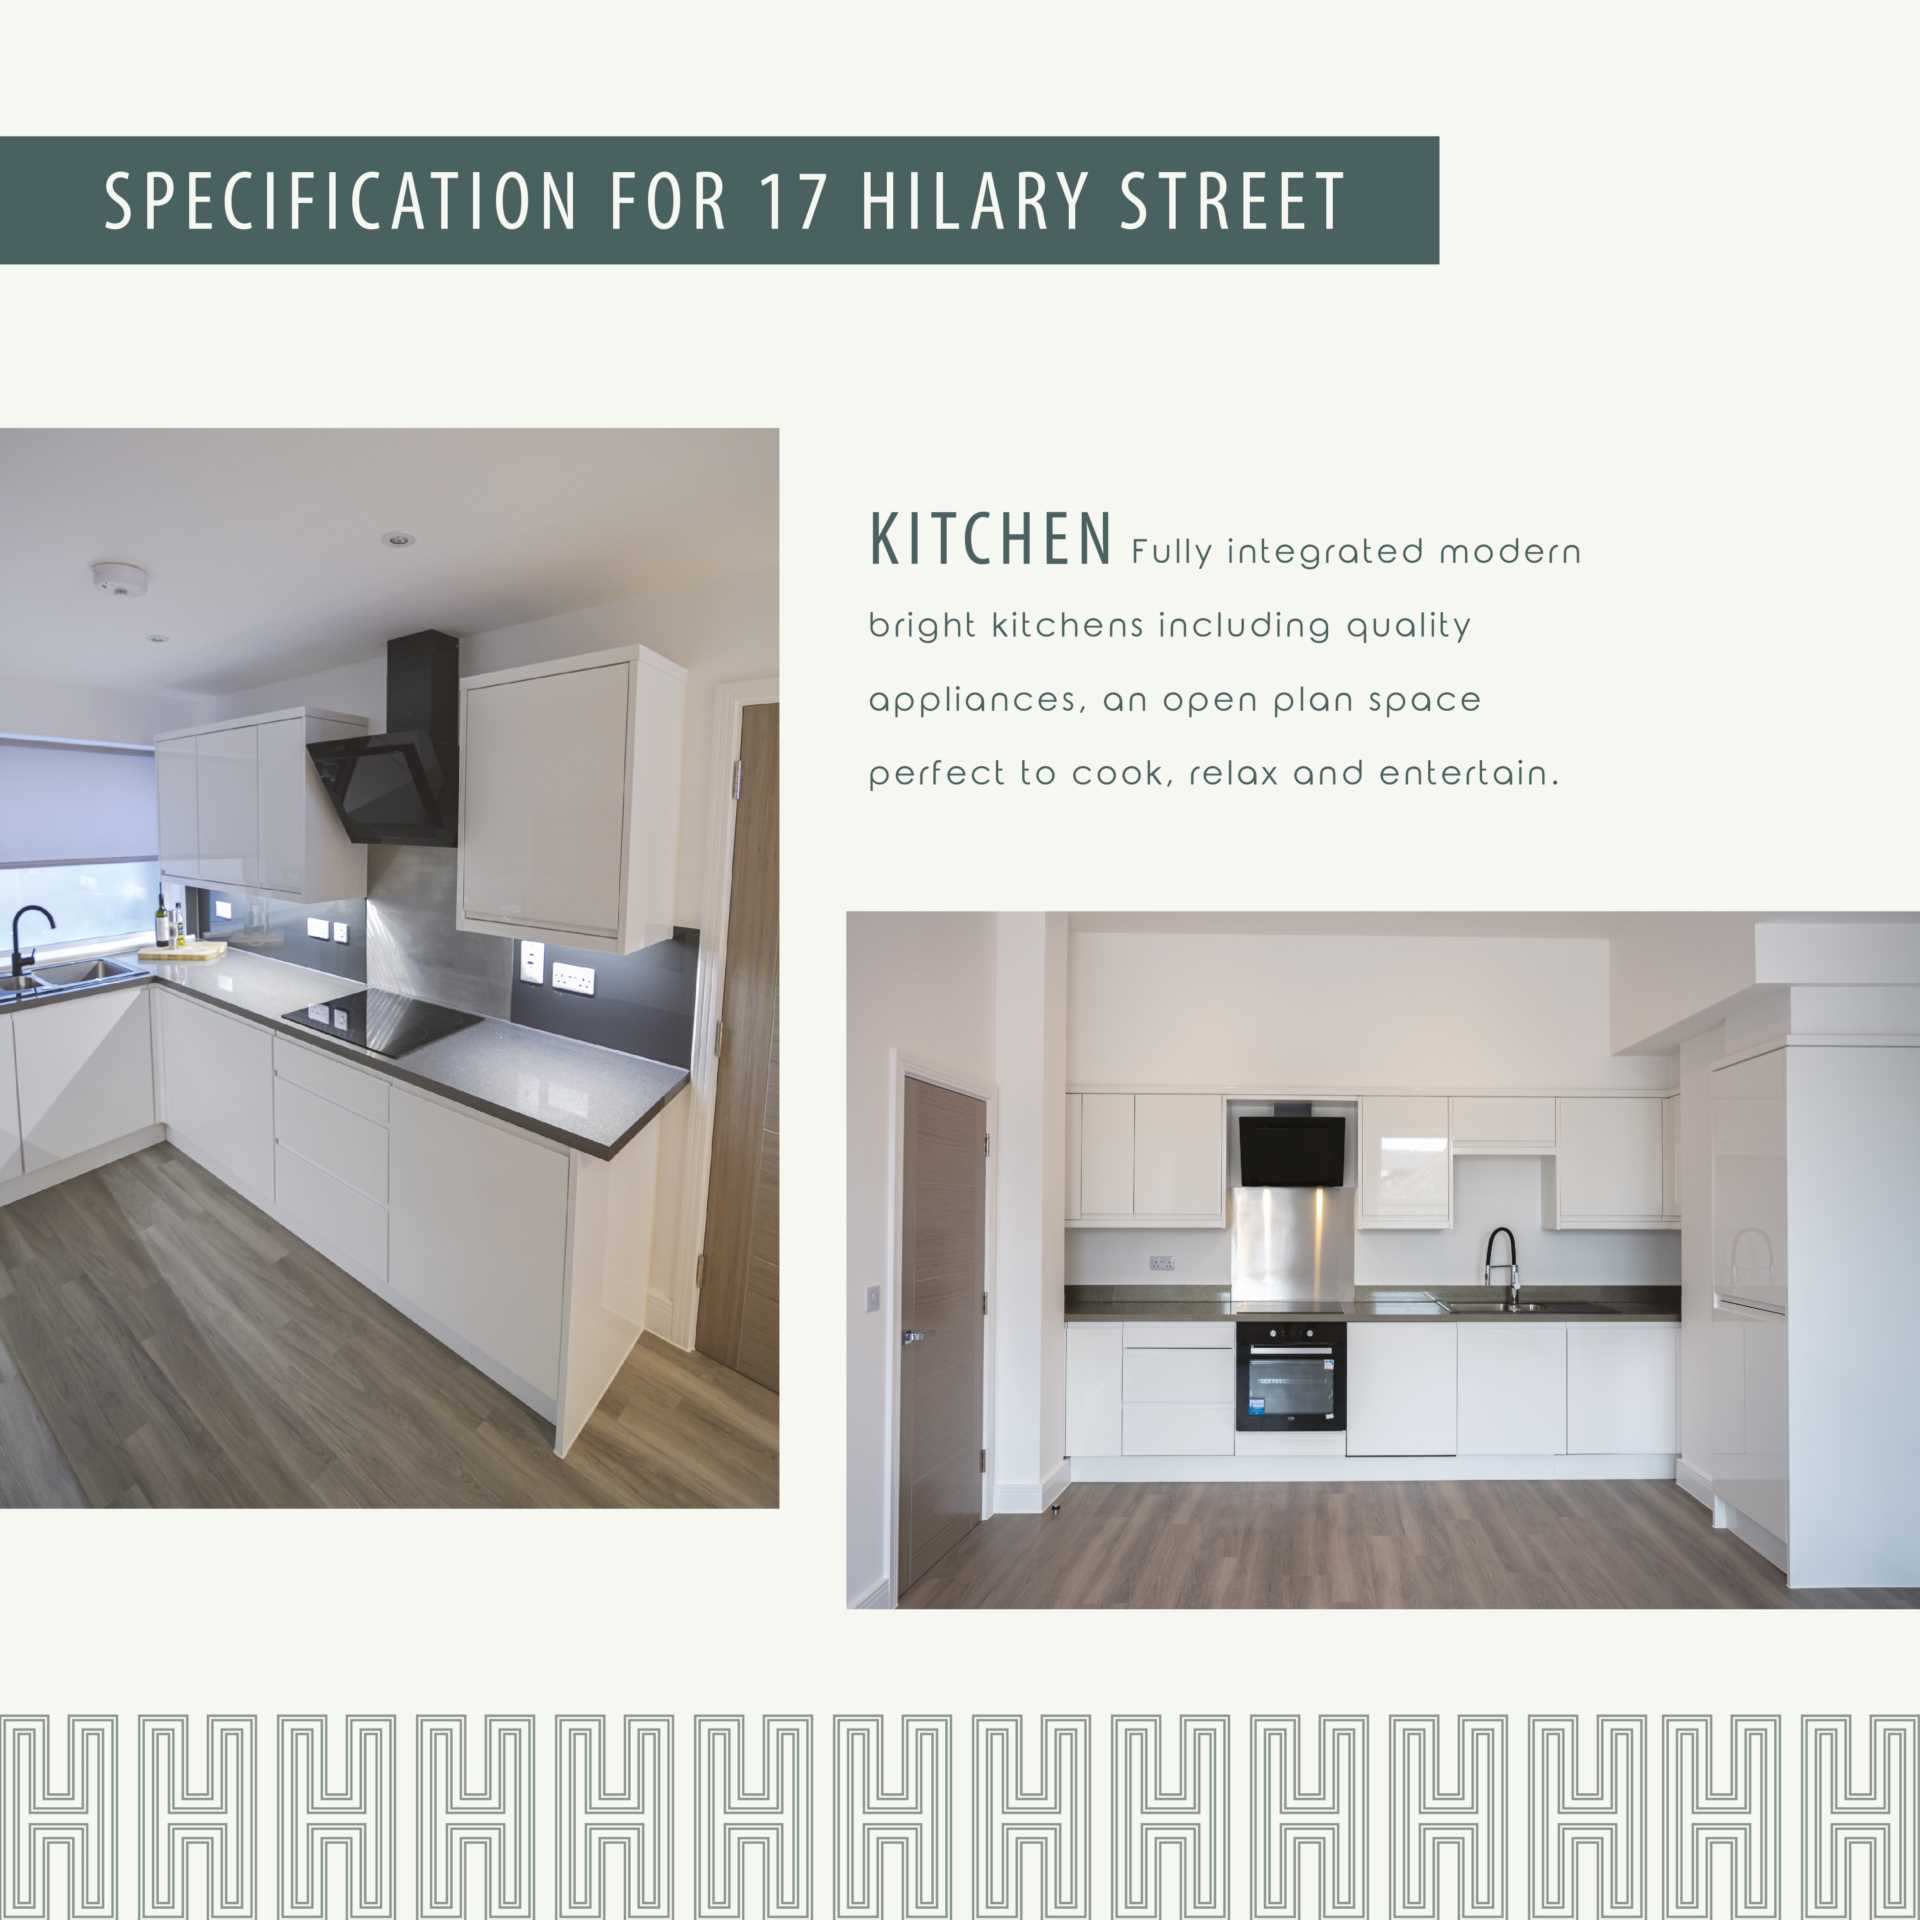 Flat 3, 17 Hilary Street, Image 4